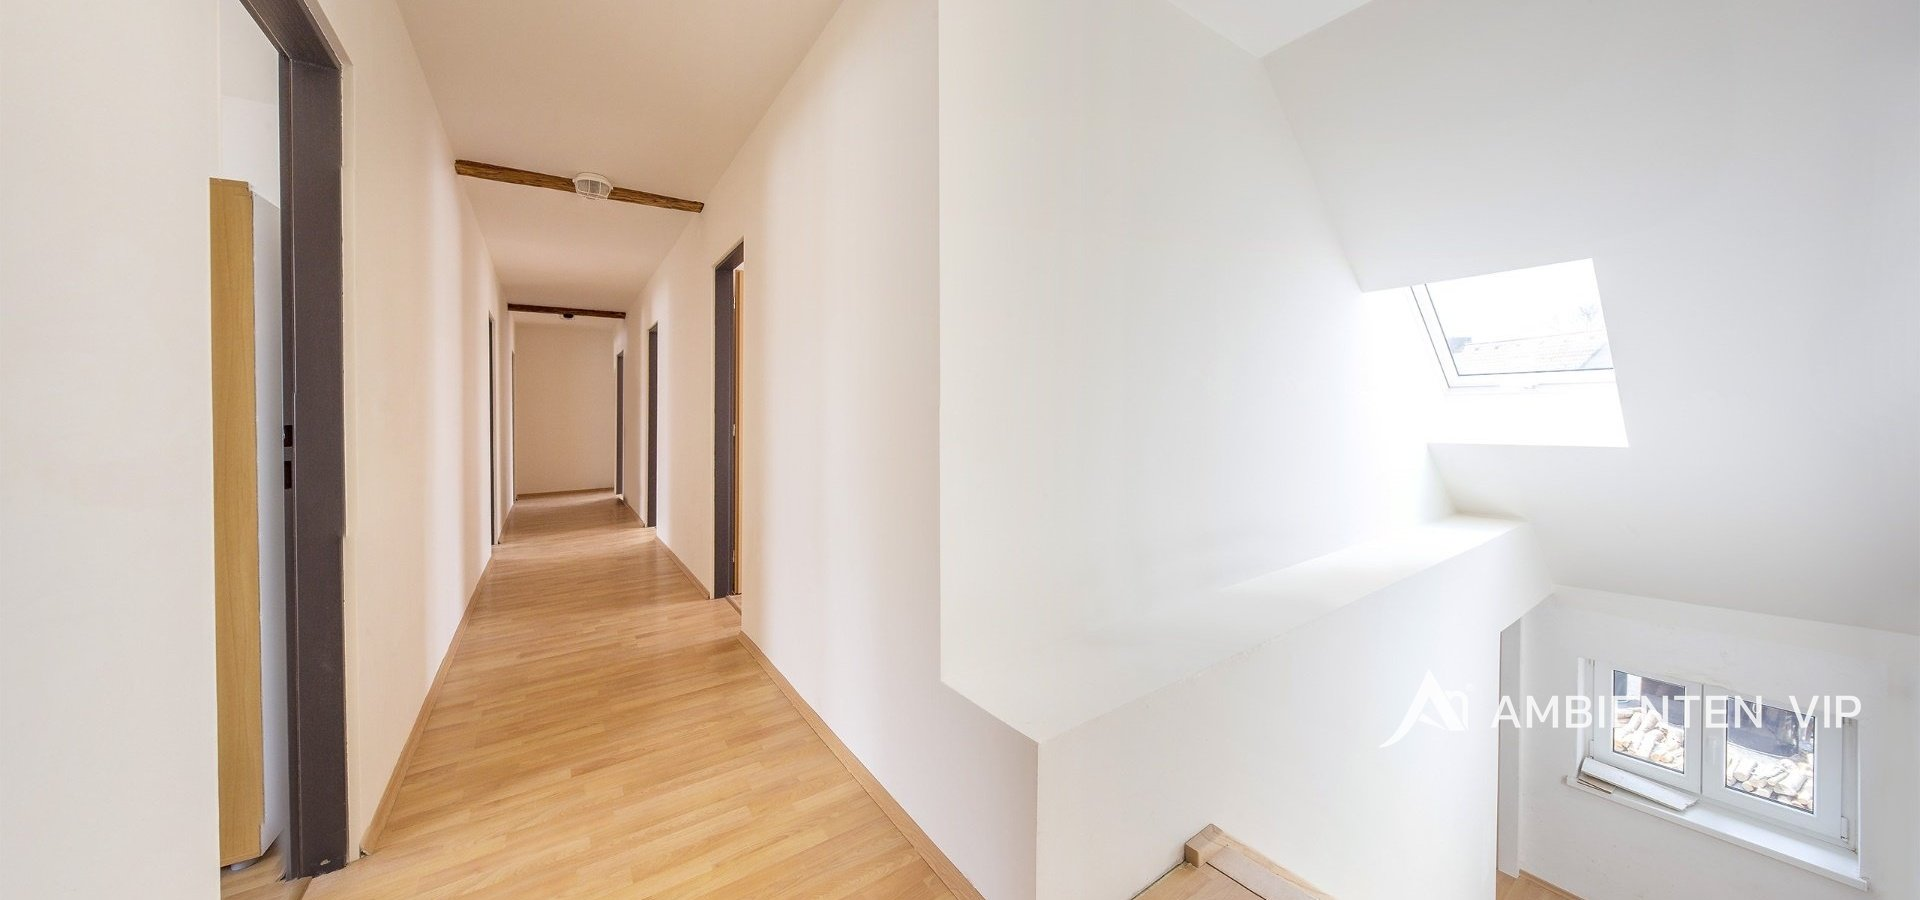 prodej-rodinneho-domu-na-bydleni-i-investici-477m2-telc-18merge-360c43